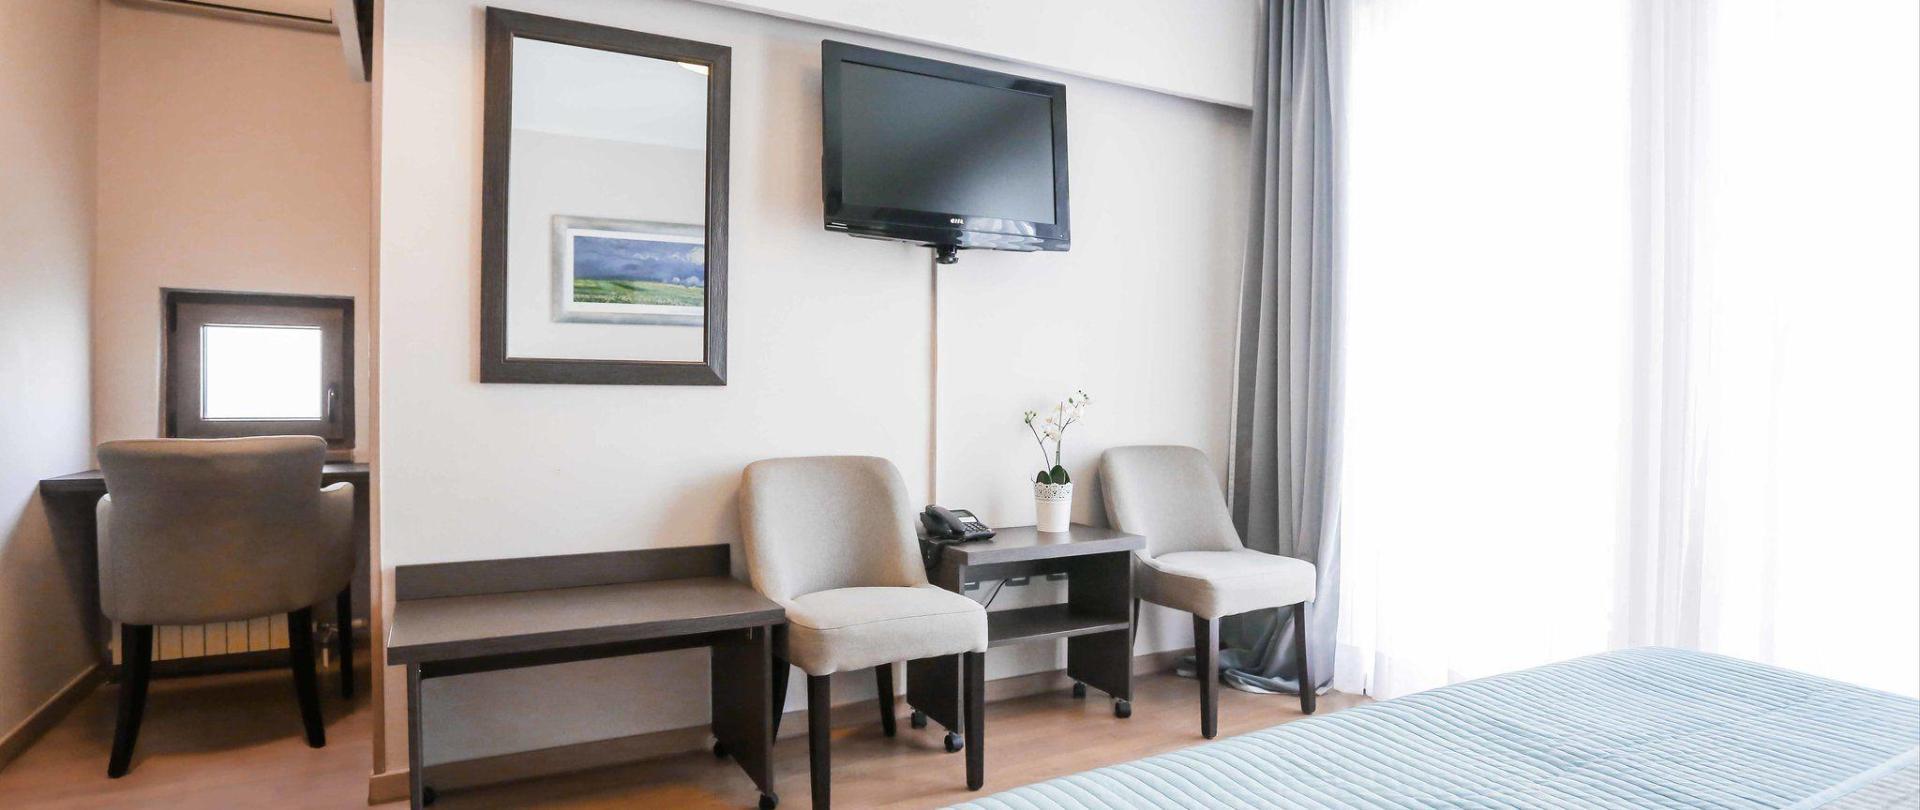 hotel-divan-by-dzenat-drekovic-29-08-2016-12.jpg